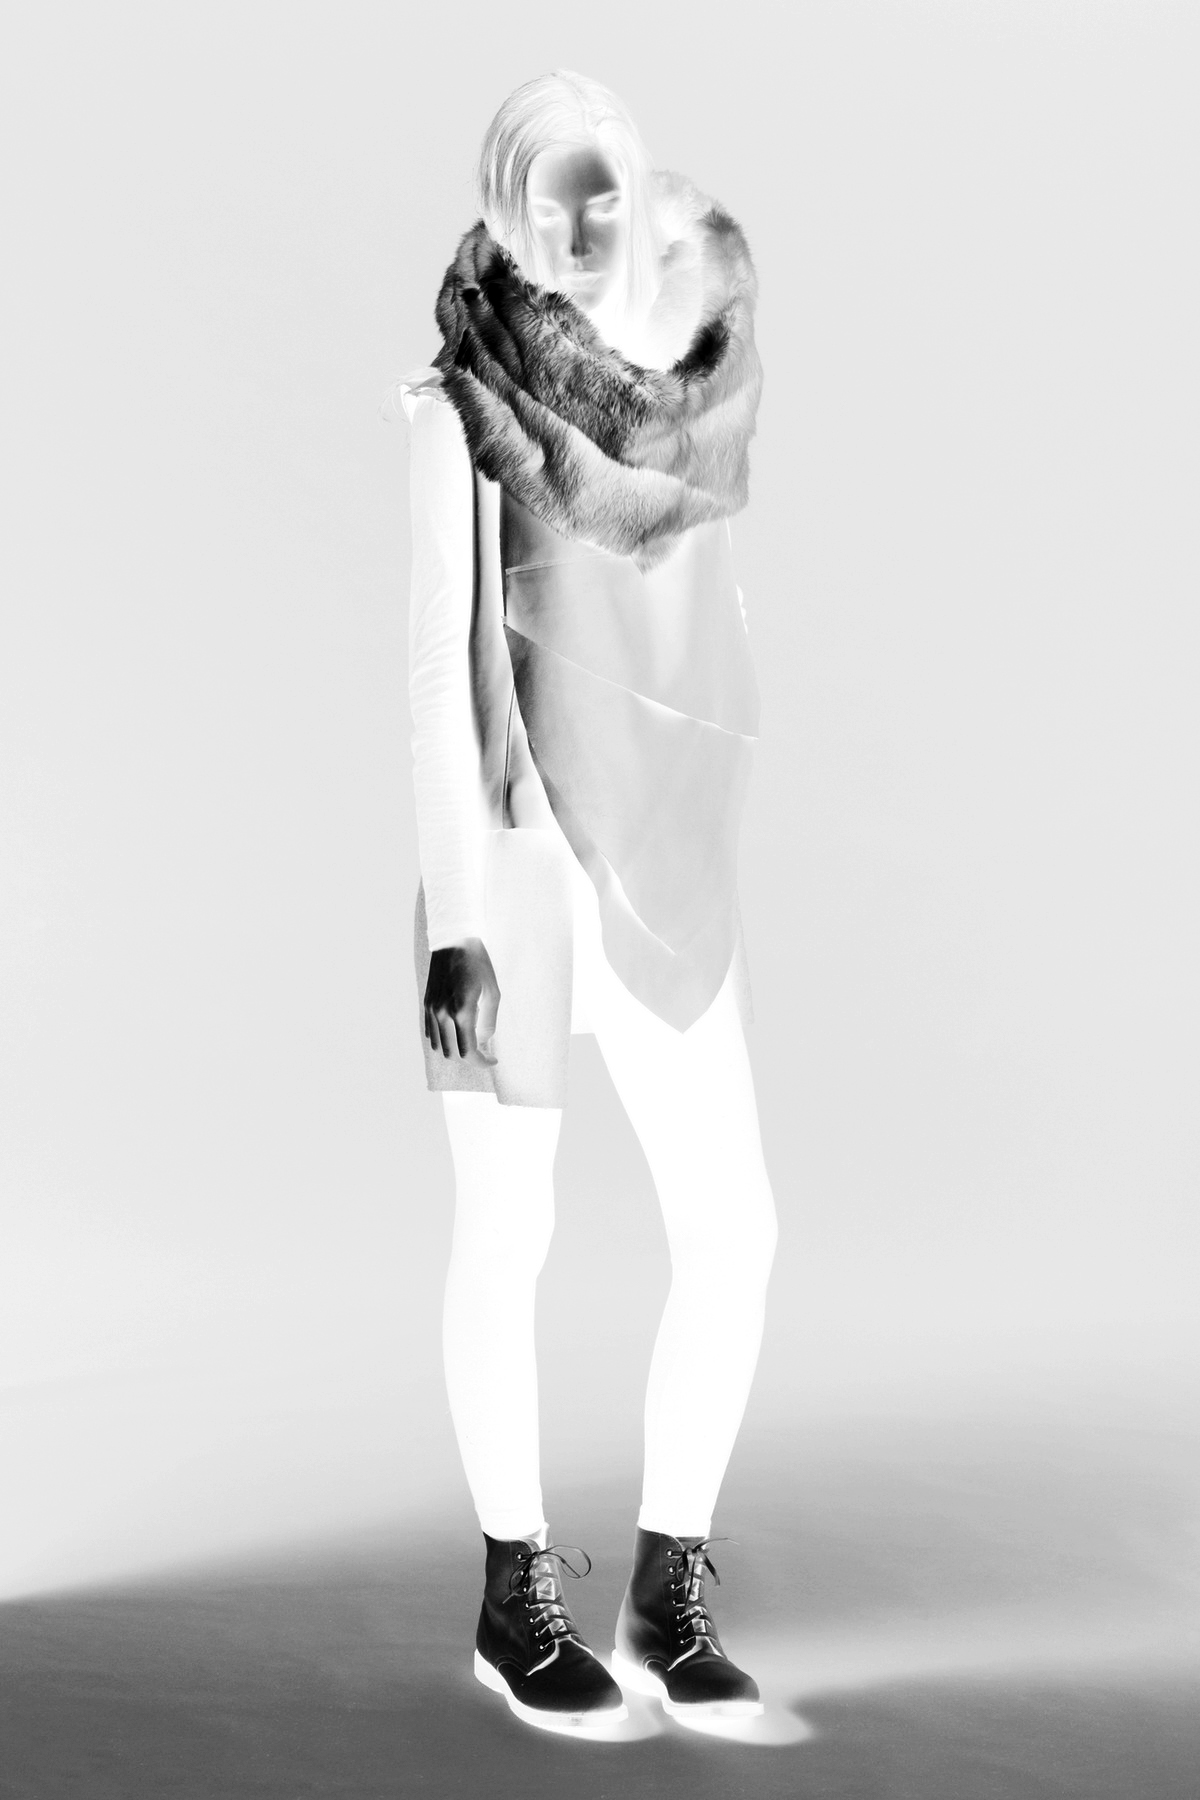 Starkweather+Fur+Tiered+Crux+Inverted.jpg